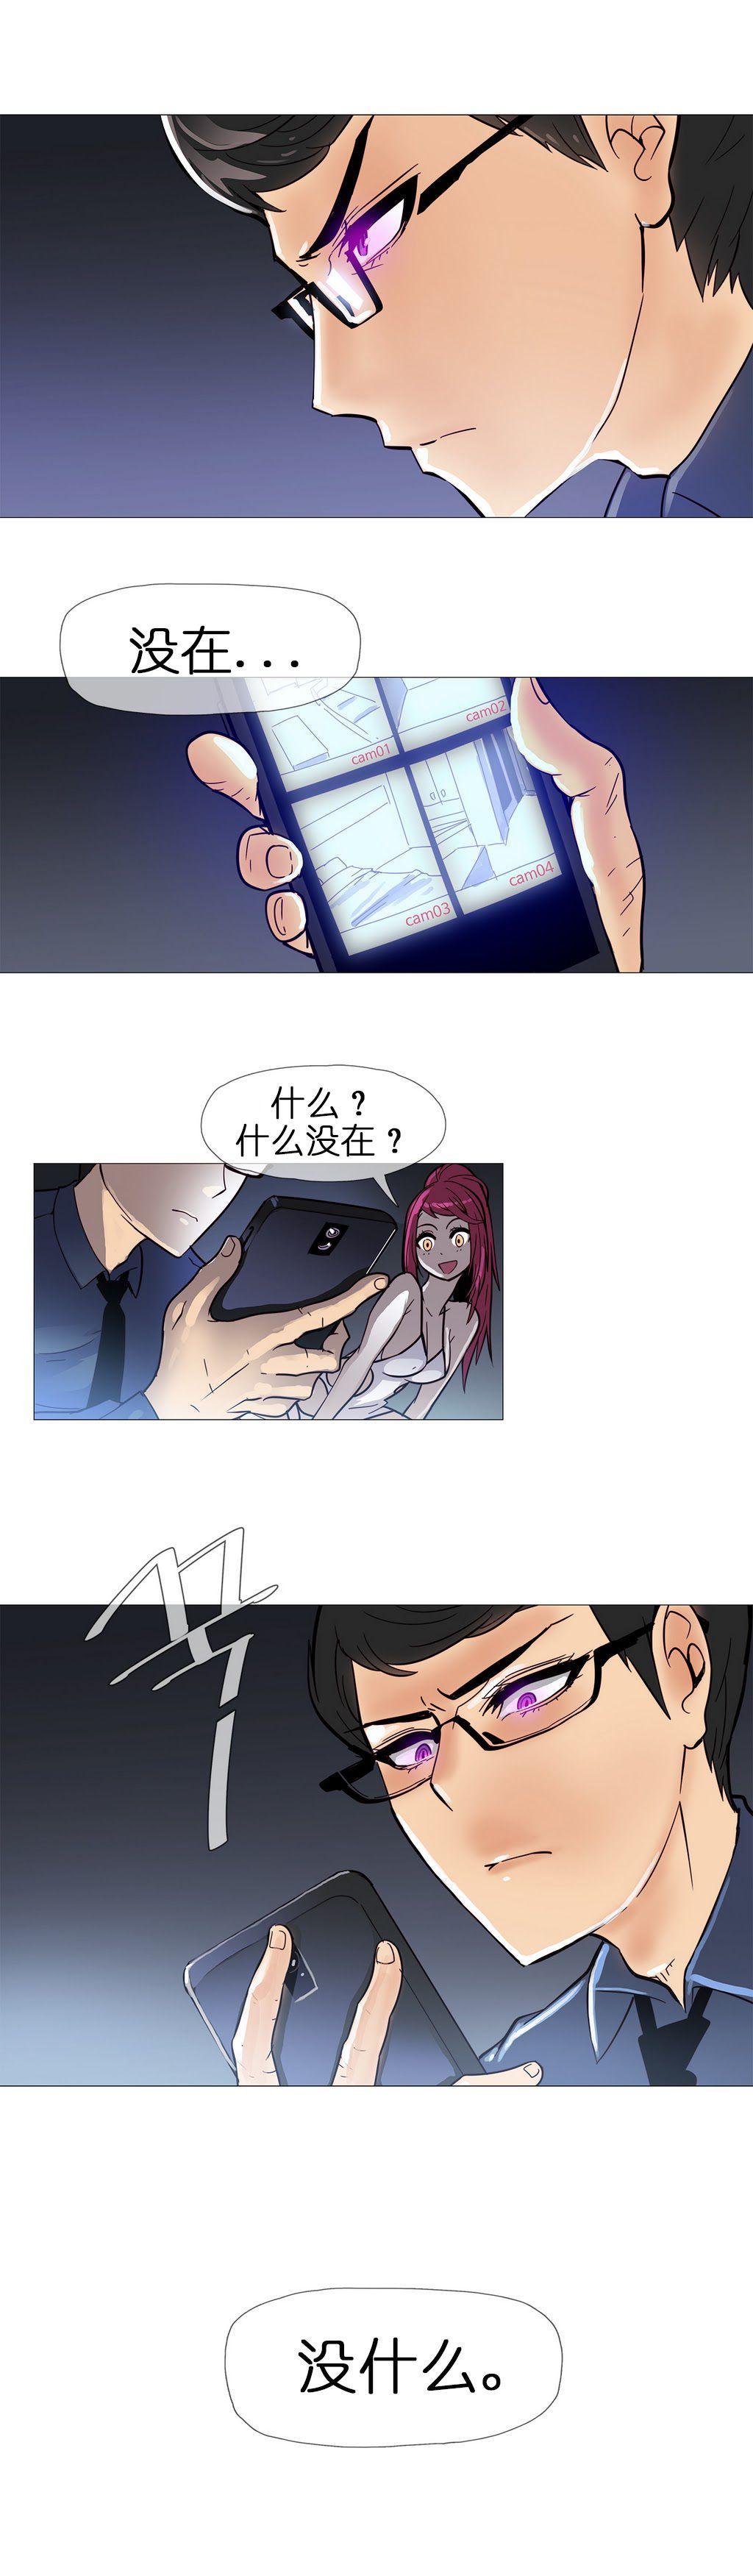 HouseHold Affairs 【卞赤鲤个人汉化】1~33话(持续更新中) 182